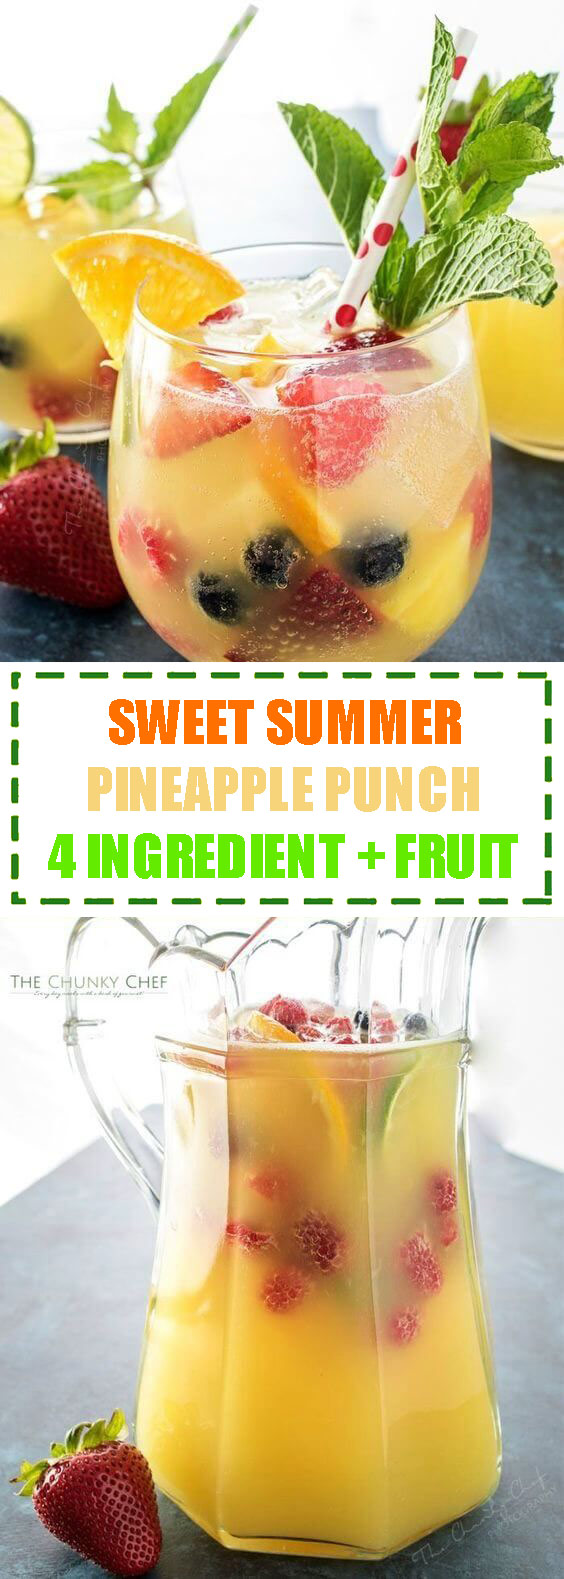 Sweet Summer Pineapple Punch 4 Ingredient + Fruit